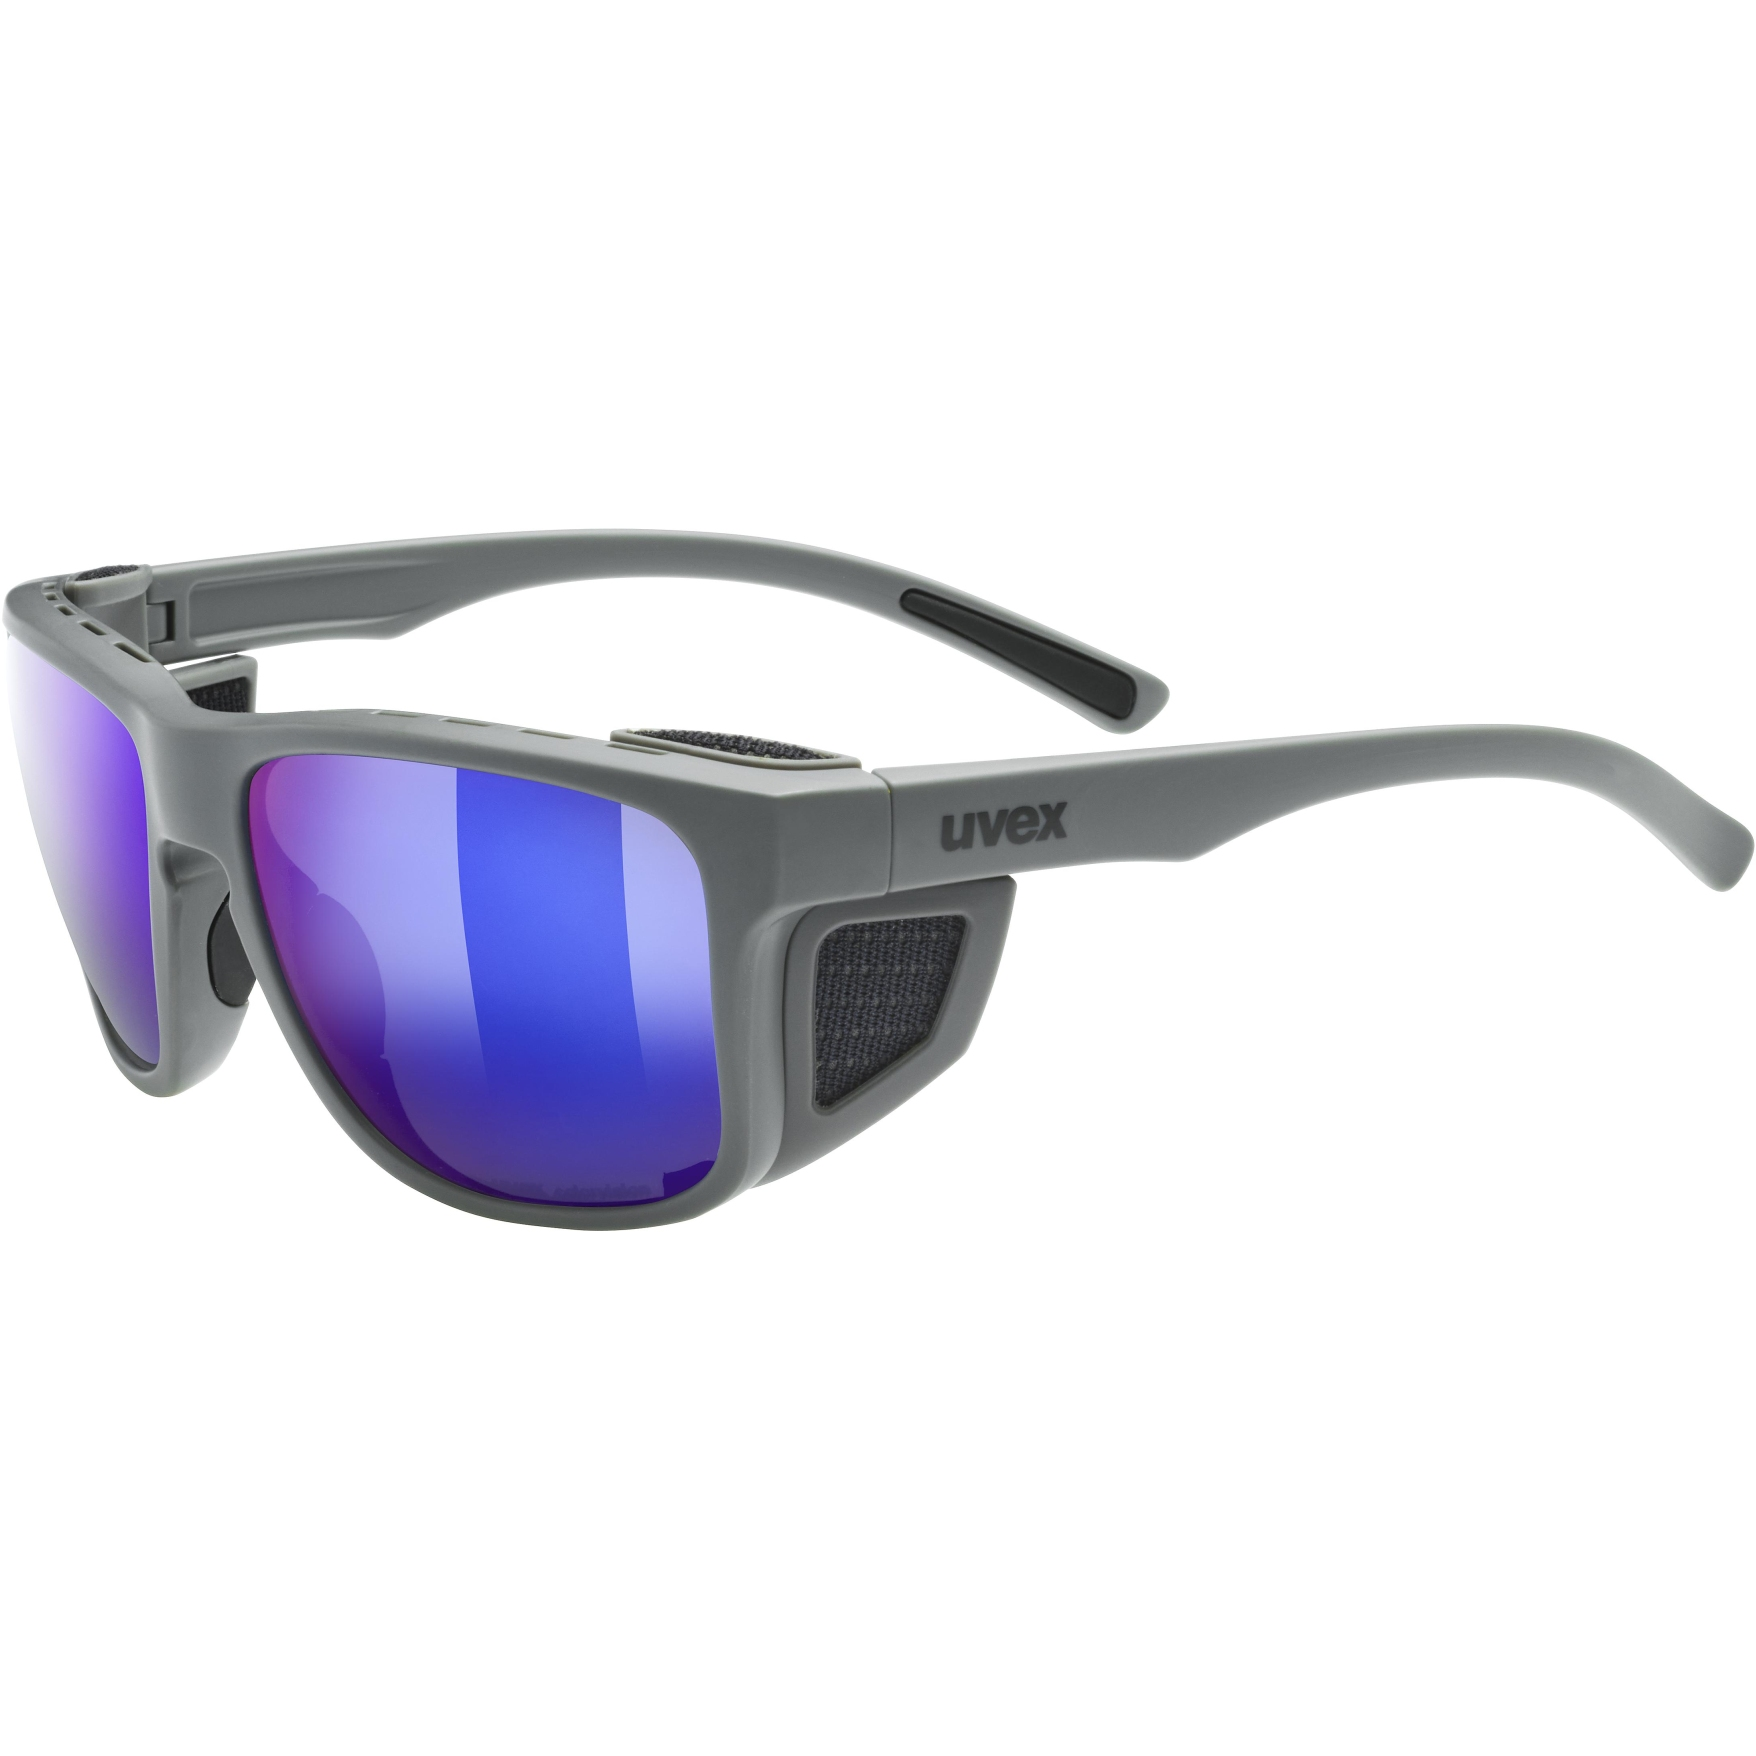 Uvex sportstyle 312 CV Glasses - rhino mat/colorvision mirror green